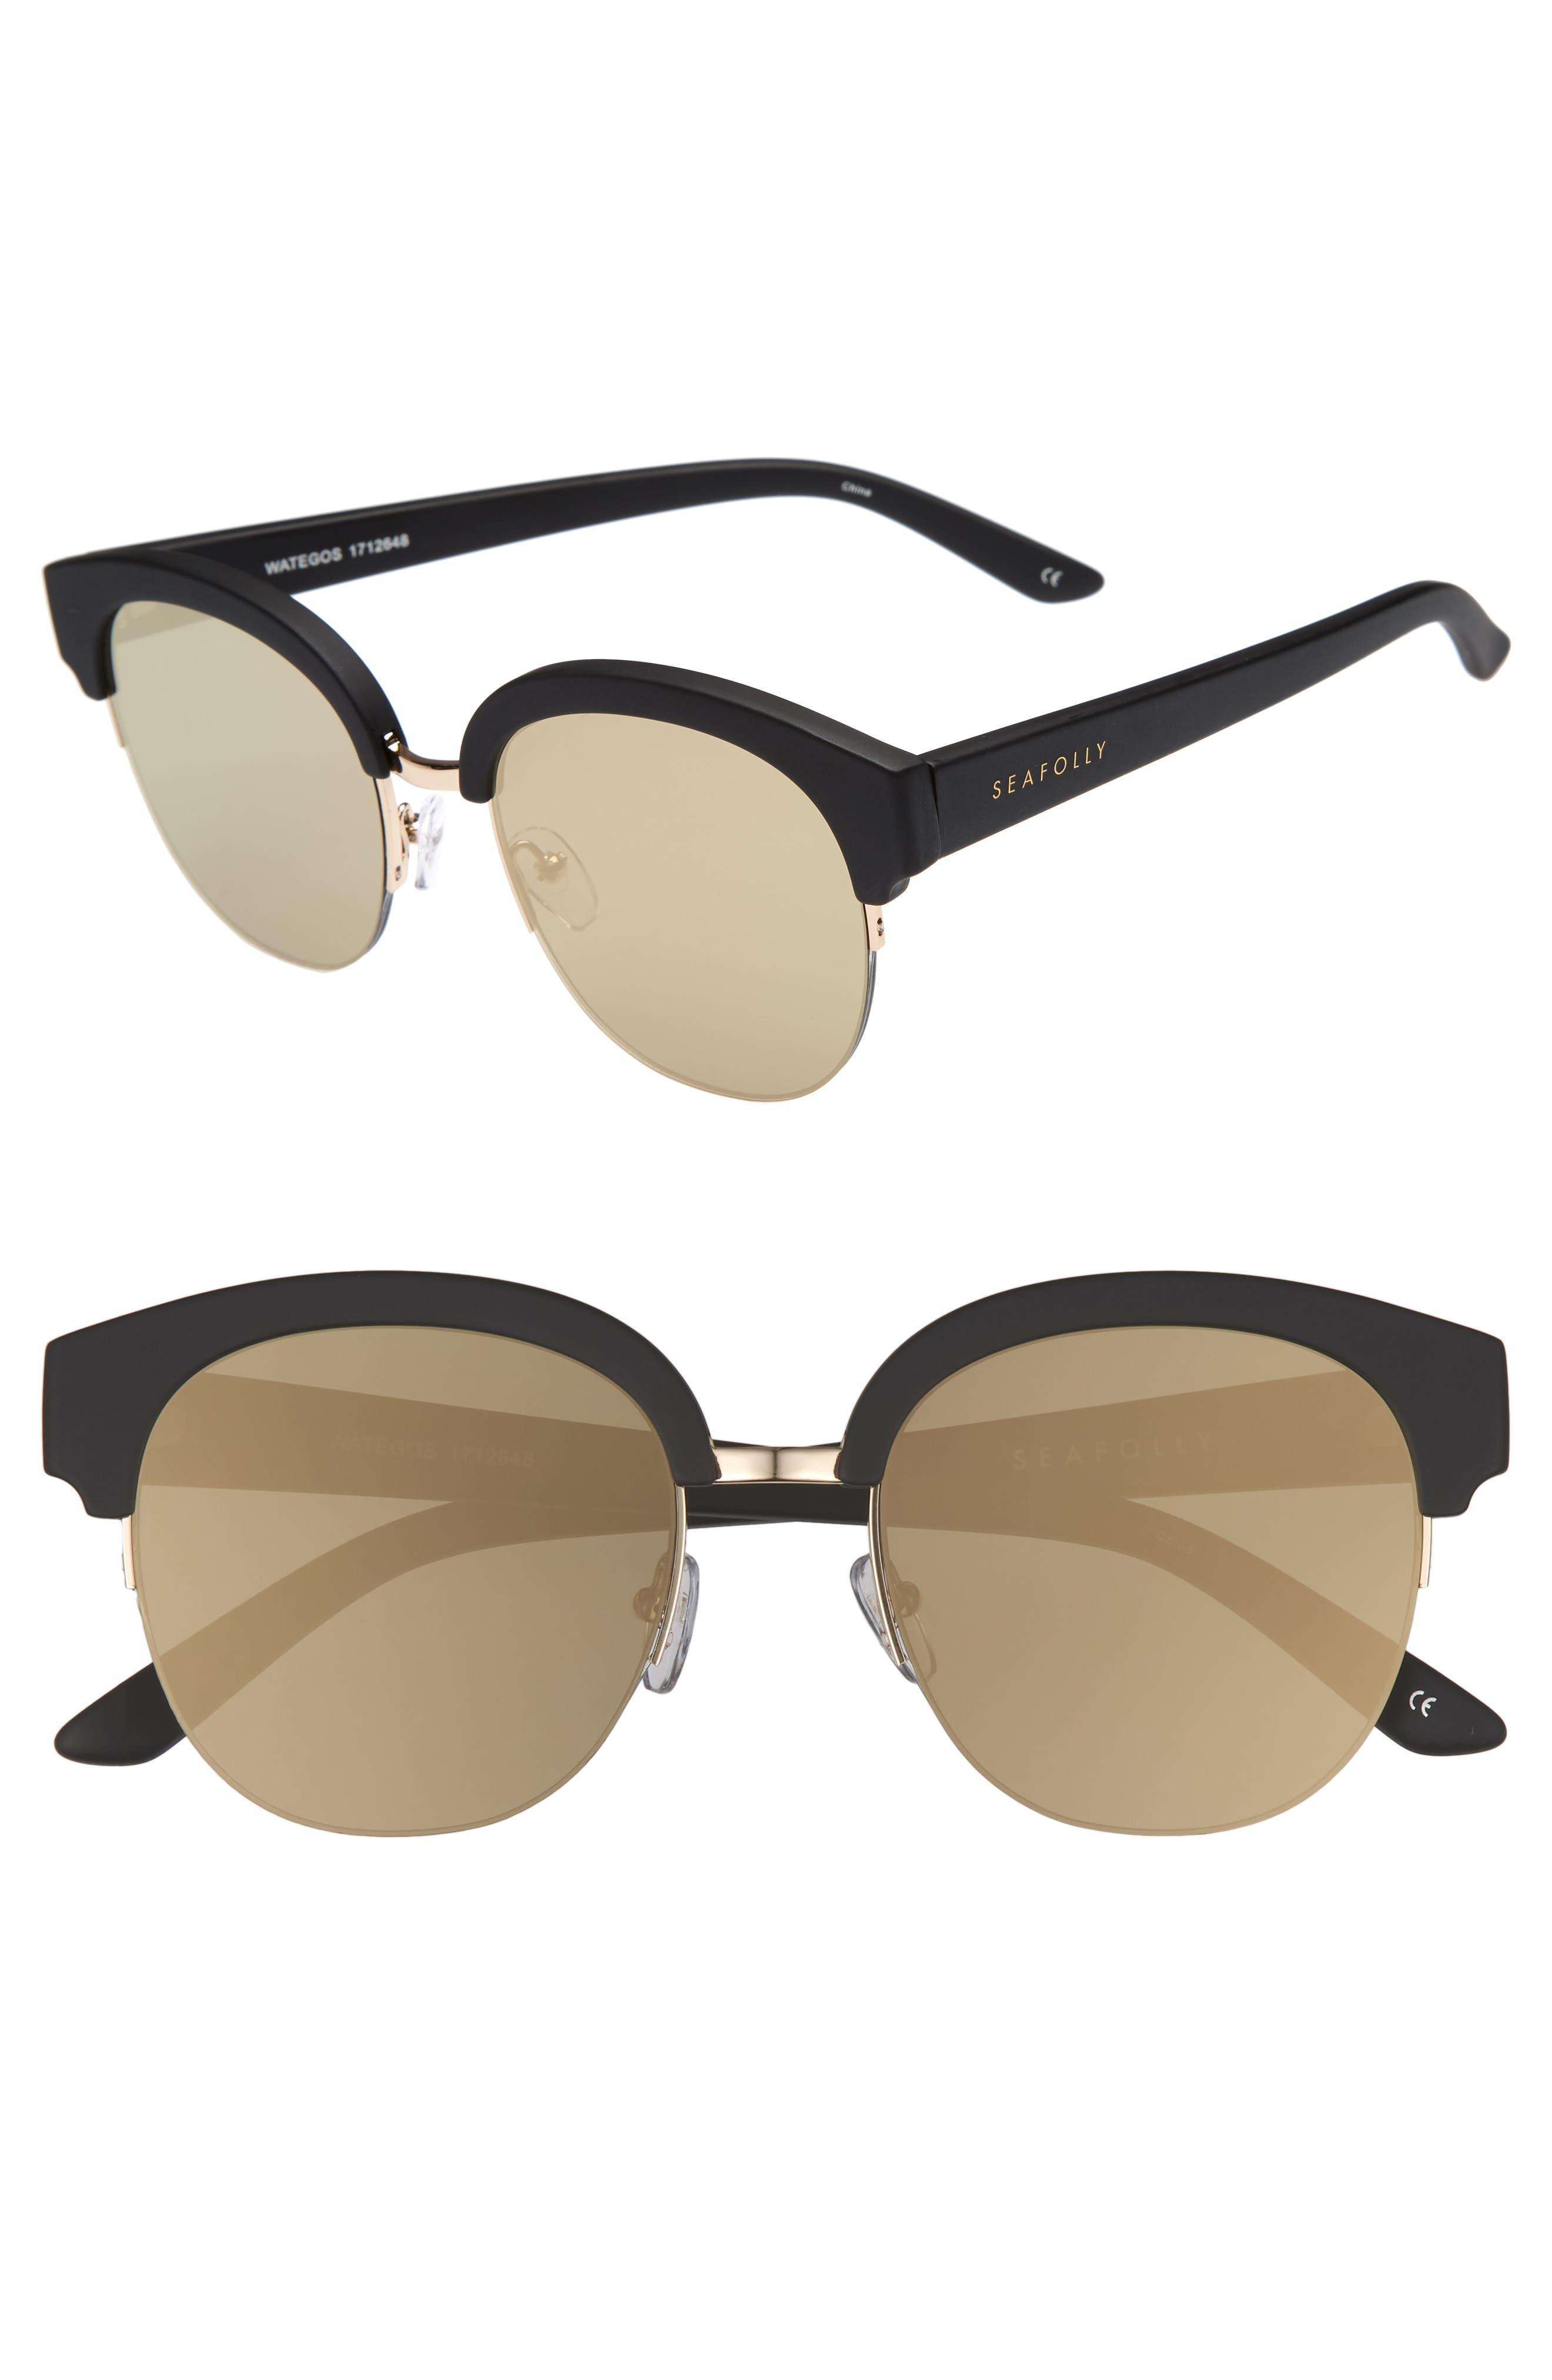 Wategos 53mm Cat Eye Sunglasses,                         Main,                         color, 001